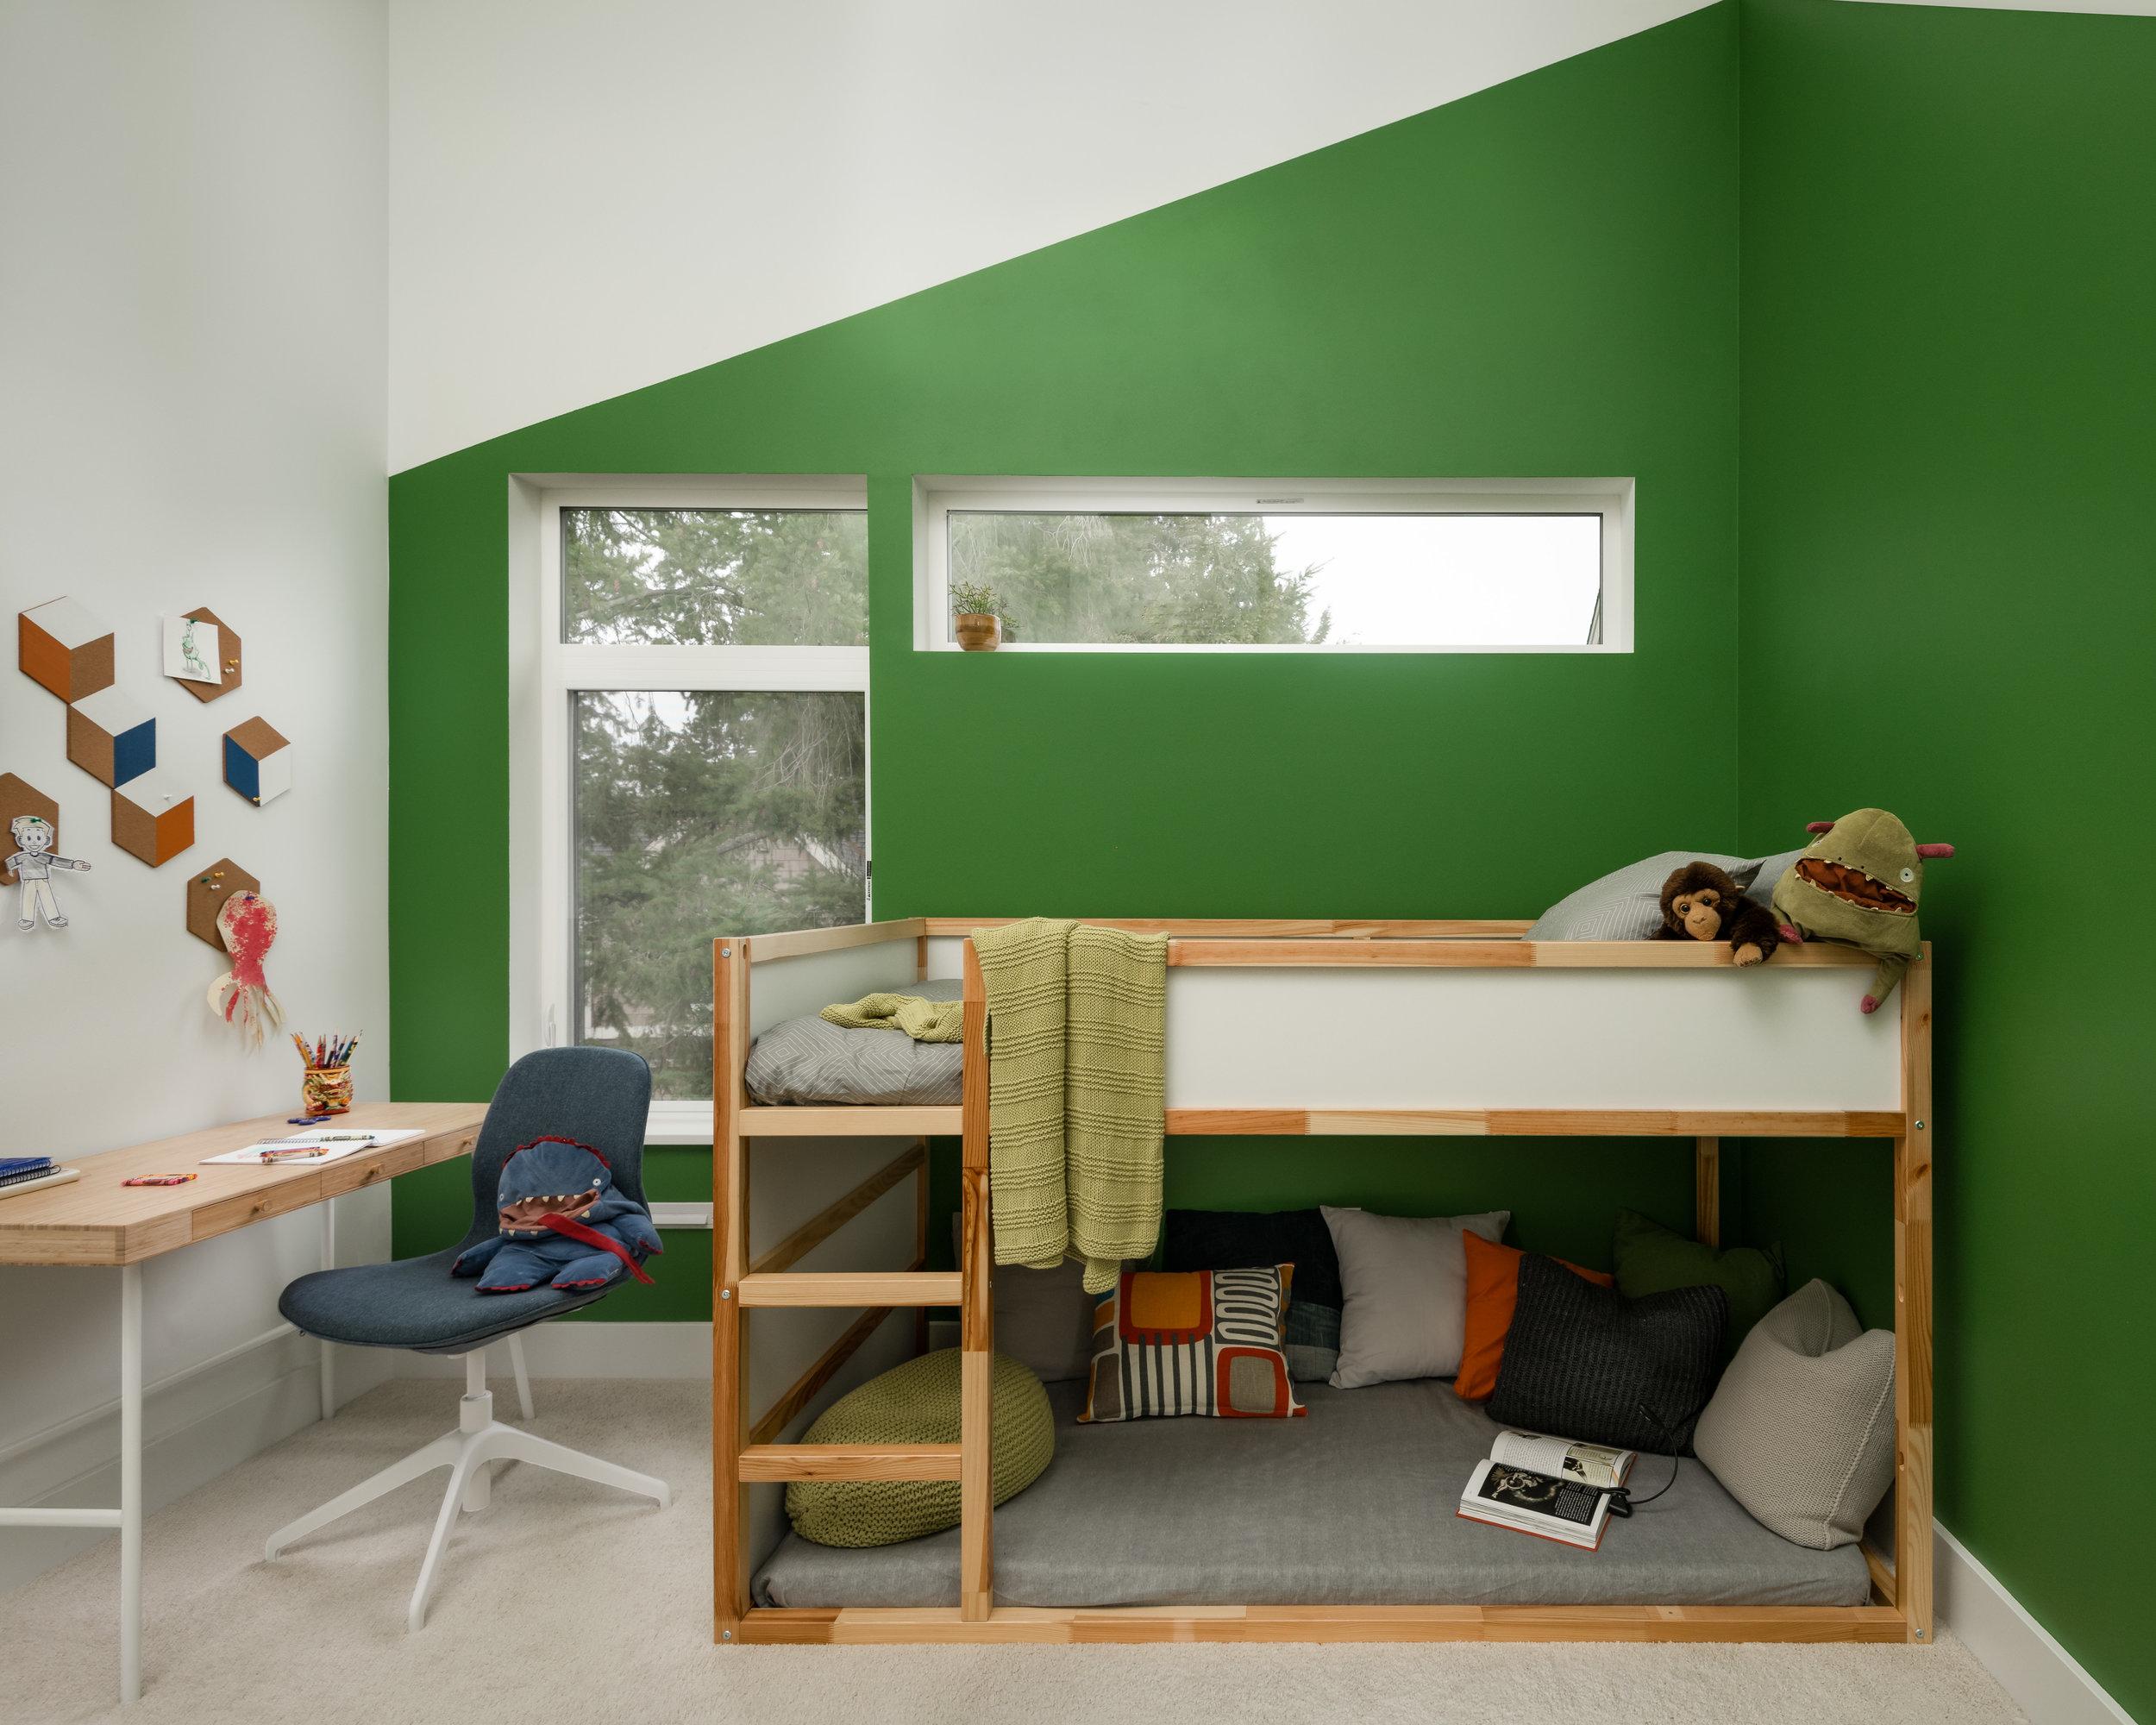 best paint colors for children's bedrooms